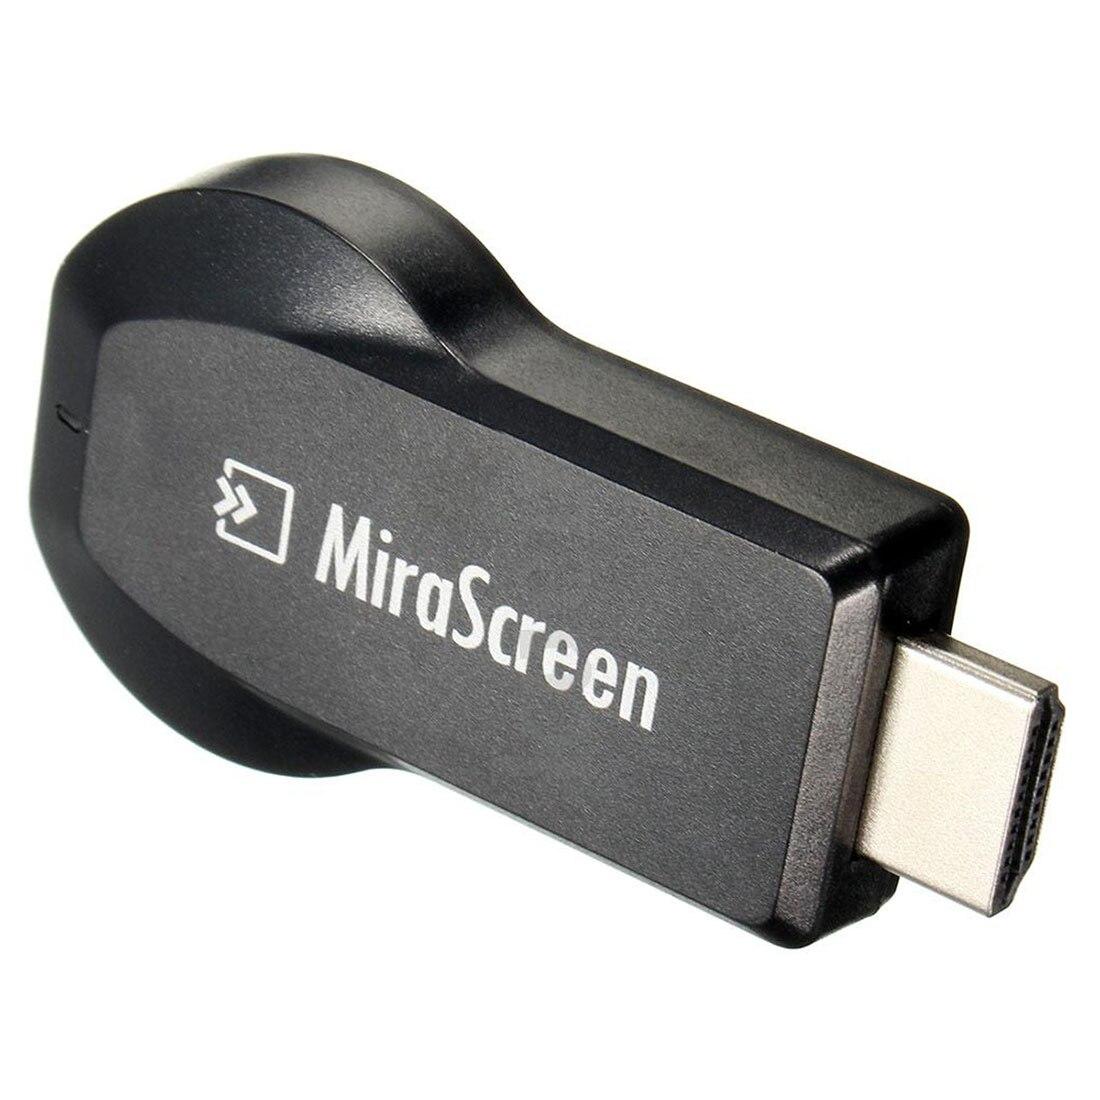 Mirascreen Mini inalámbrico Wifi Dongle pantalla